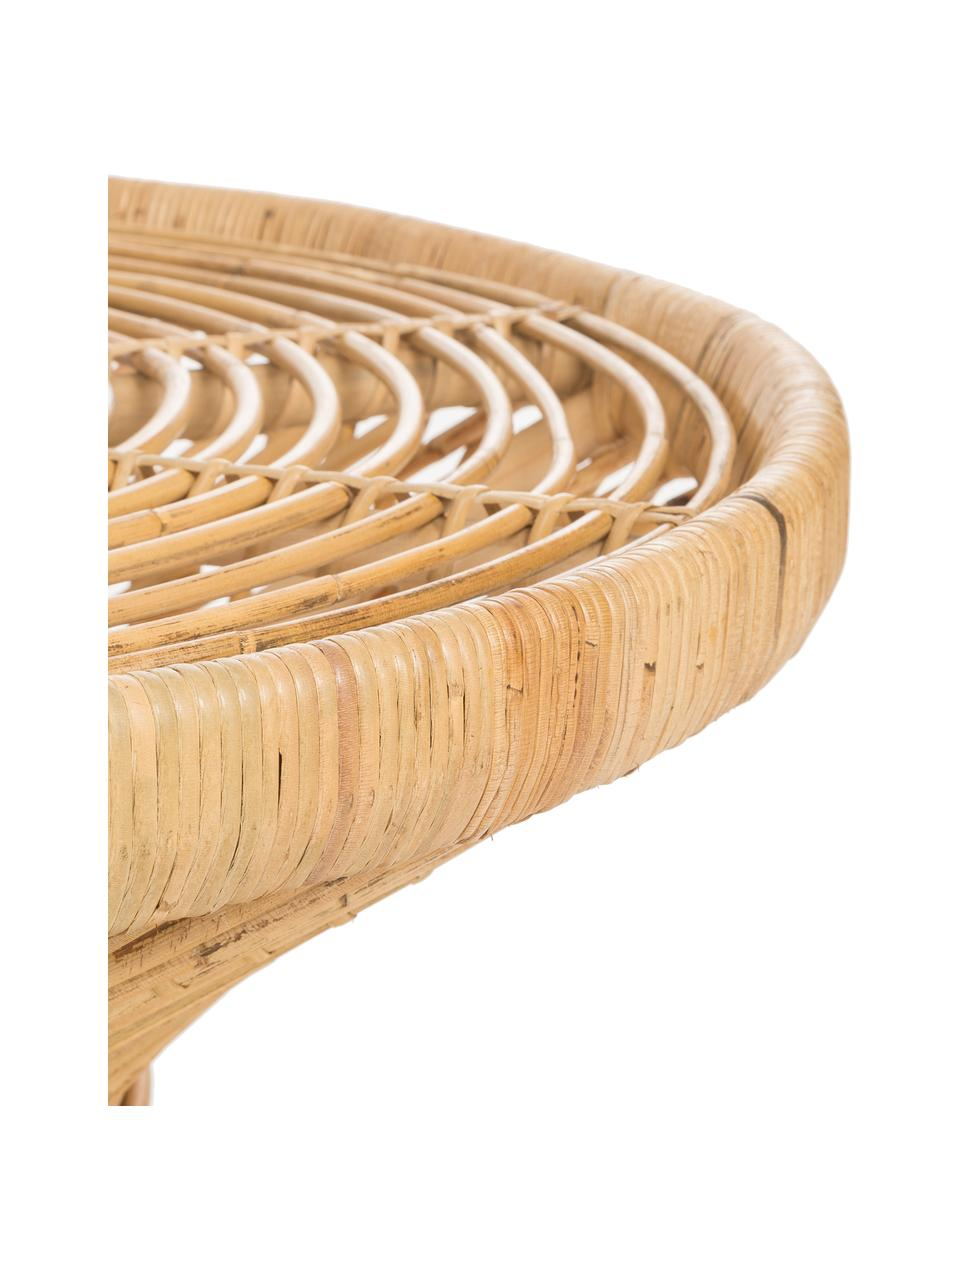 Tavolino da salotto boho in rattan Marvel, Rattan, finitura naturale, Rattan, finitura naturale, Ø 80 x Alt. 47 cm